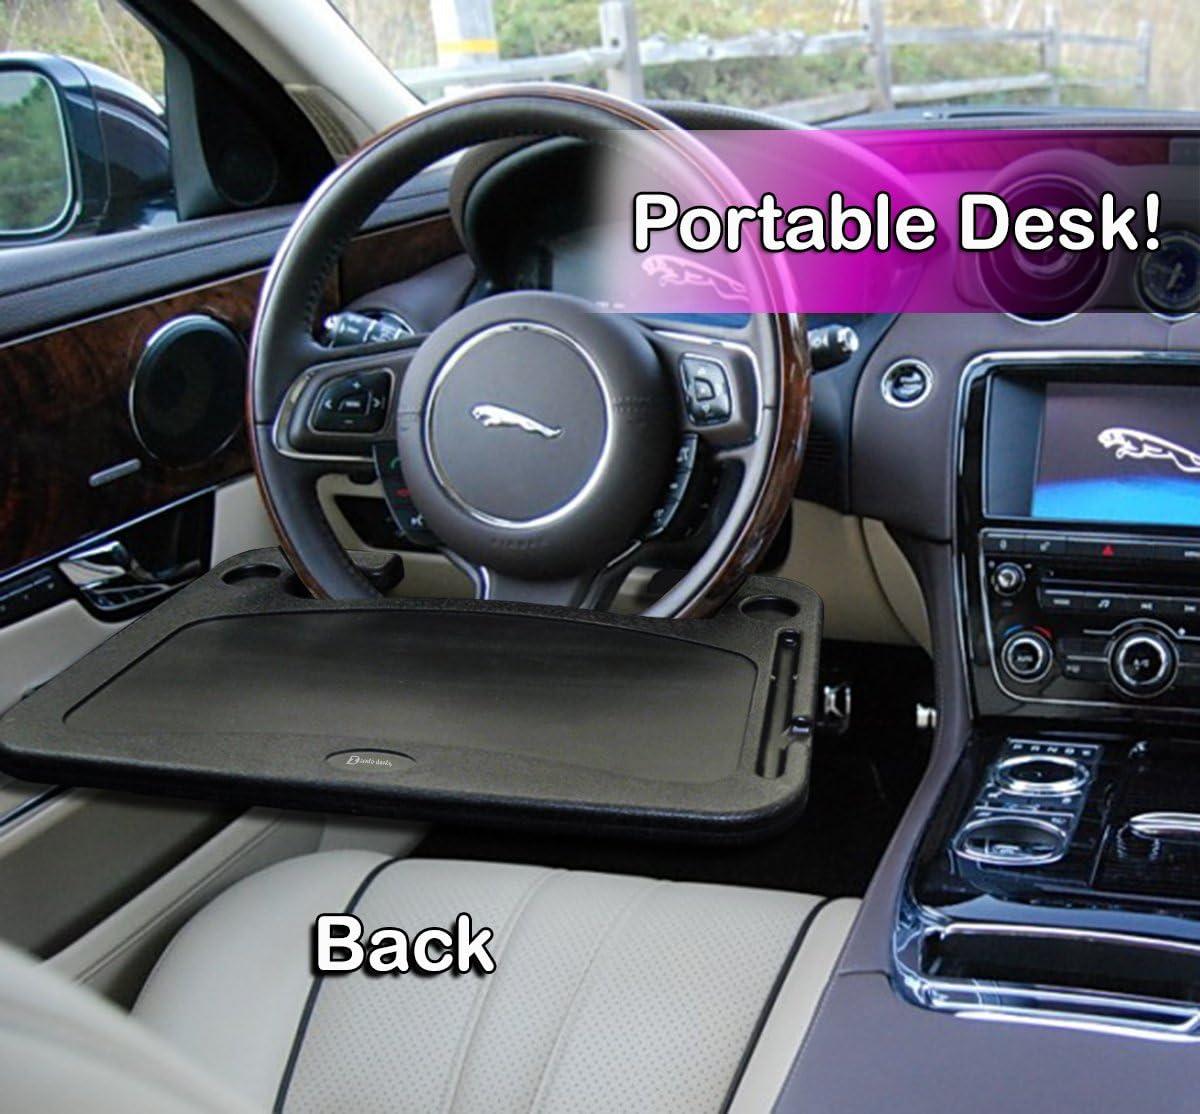 Zento Deals Multi-Purpose Portable Car Black Desk for a More Convenient Time in Your Car